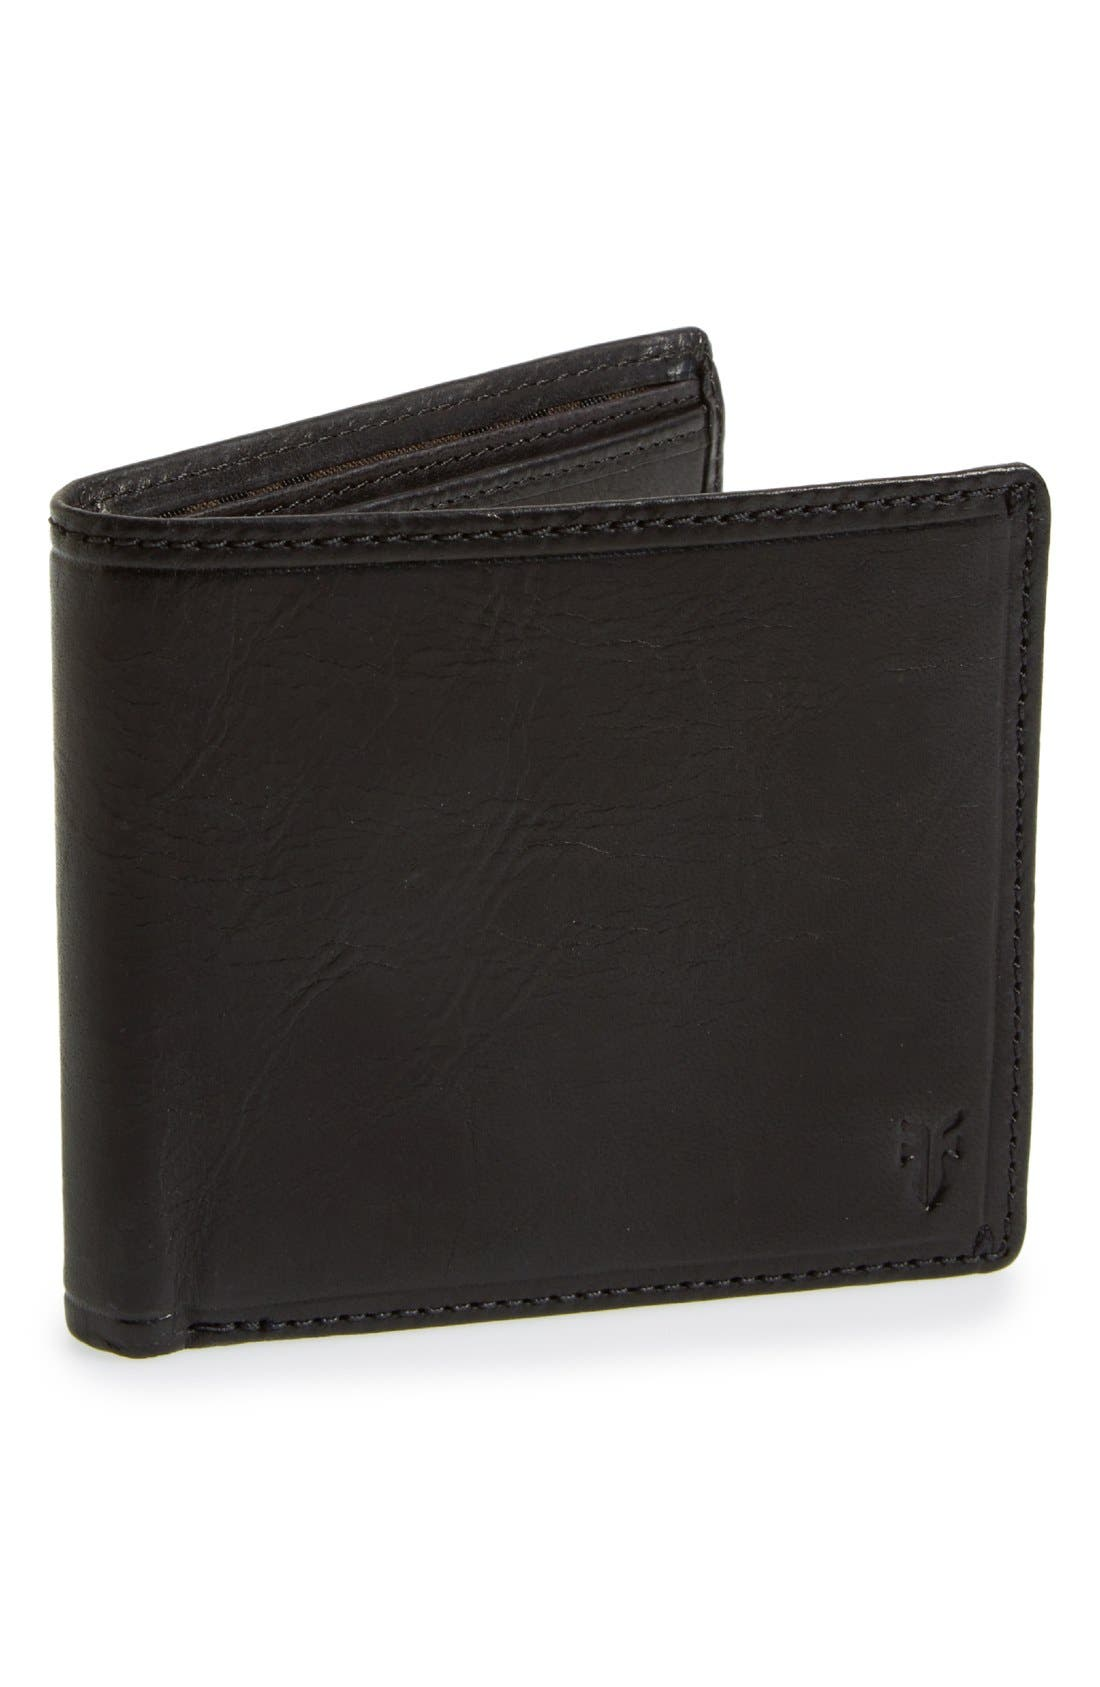 'Logan' Leather Billfold Wallet,                             Main thumbnail 1, color,